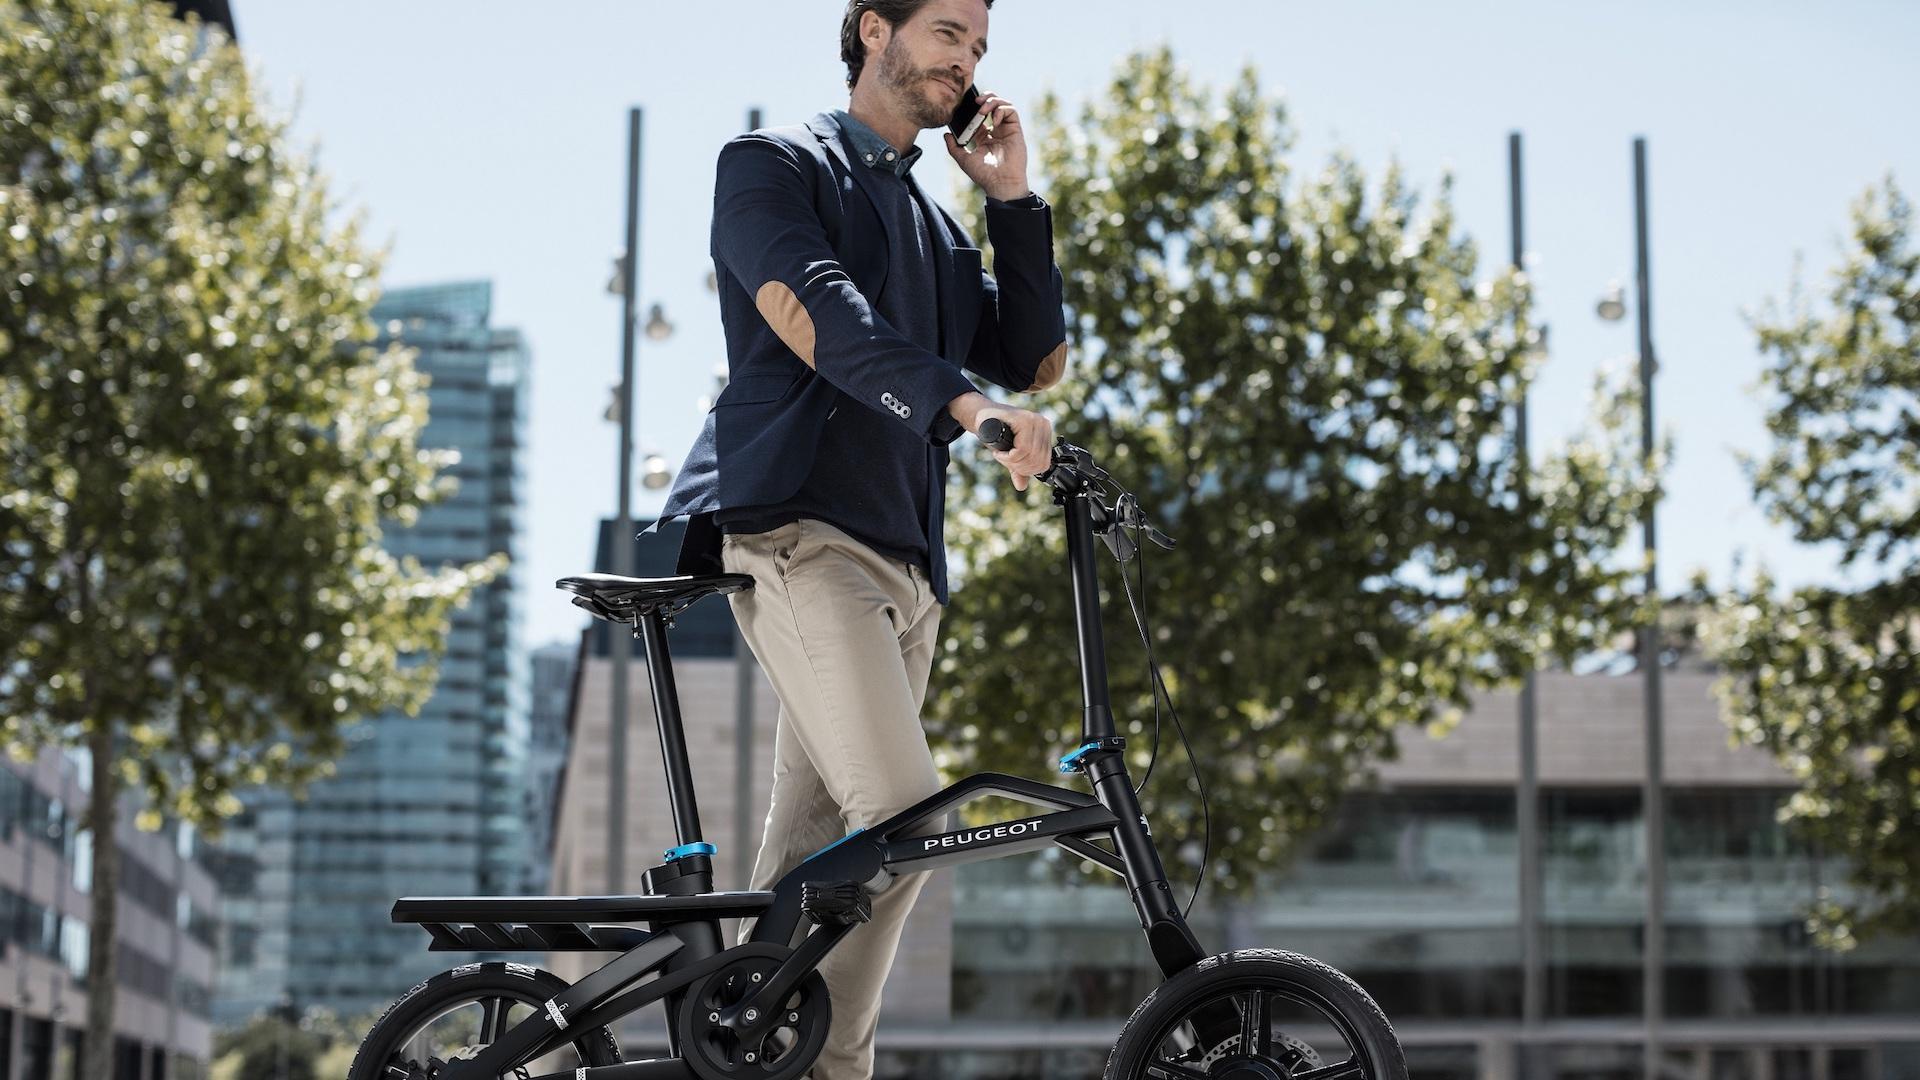 peugeot-bicicleta-09092016-in3